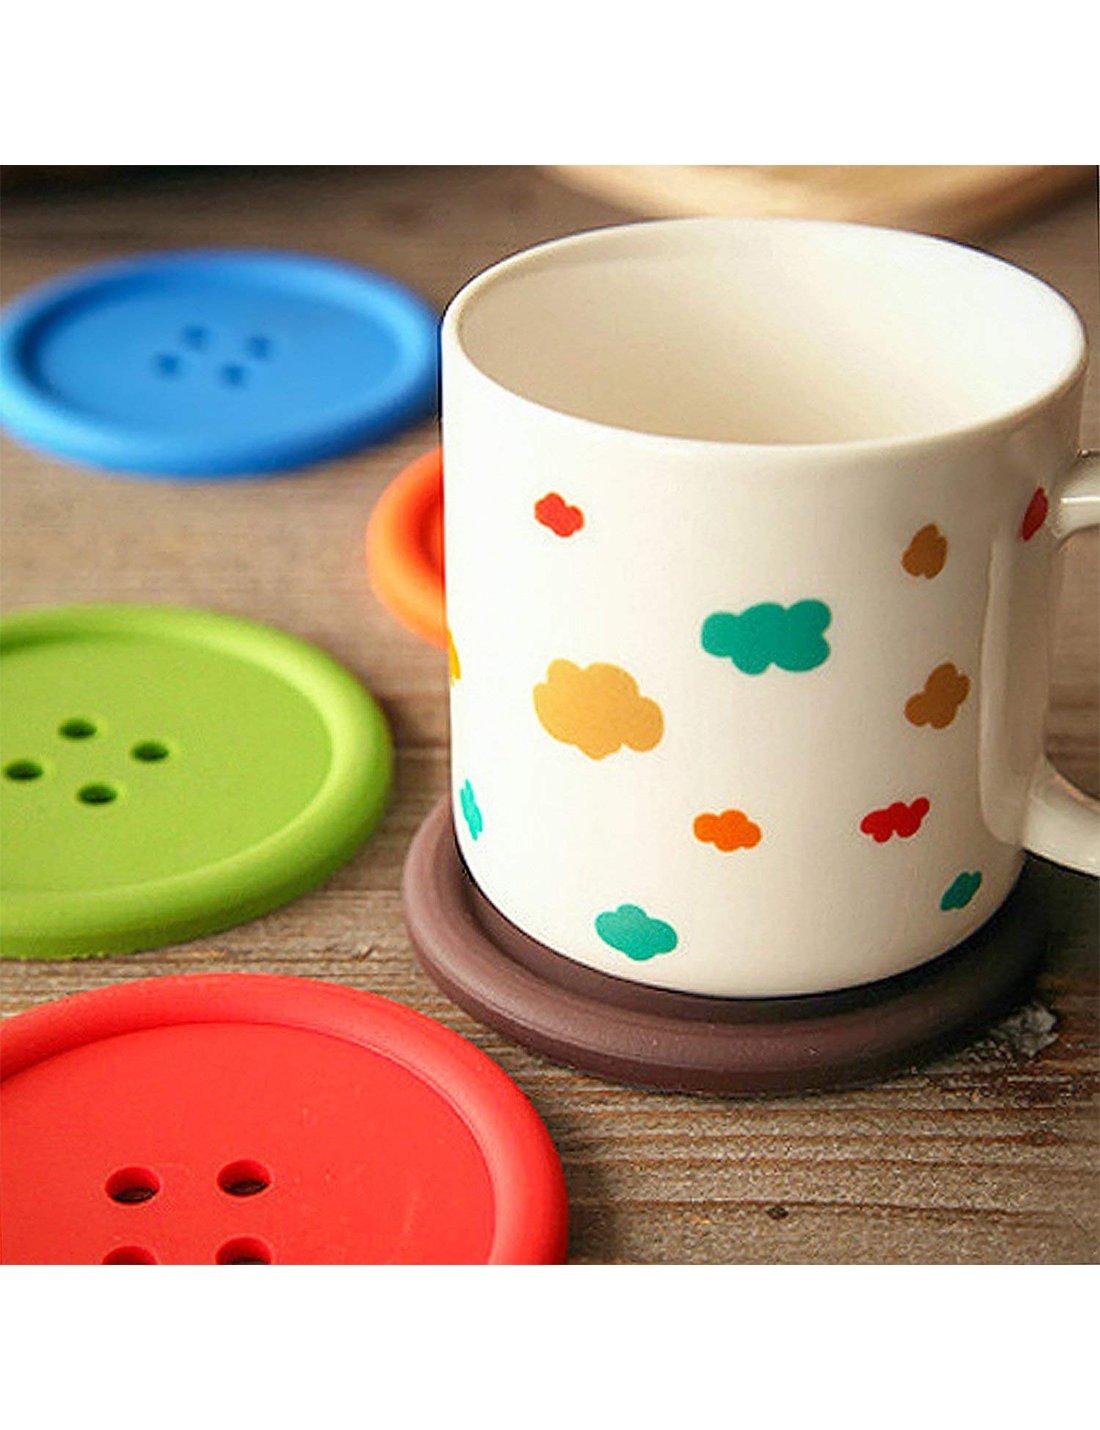 DomeStar Button Coaster, 12PCS Non Slip Drink Coaster Colorful Unique Slice Silicone Cup Mat for Drinks Prevent Furniture and Tabletop